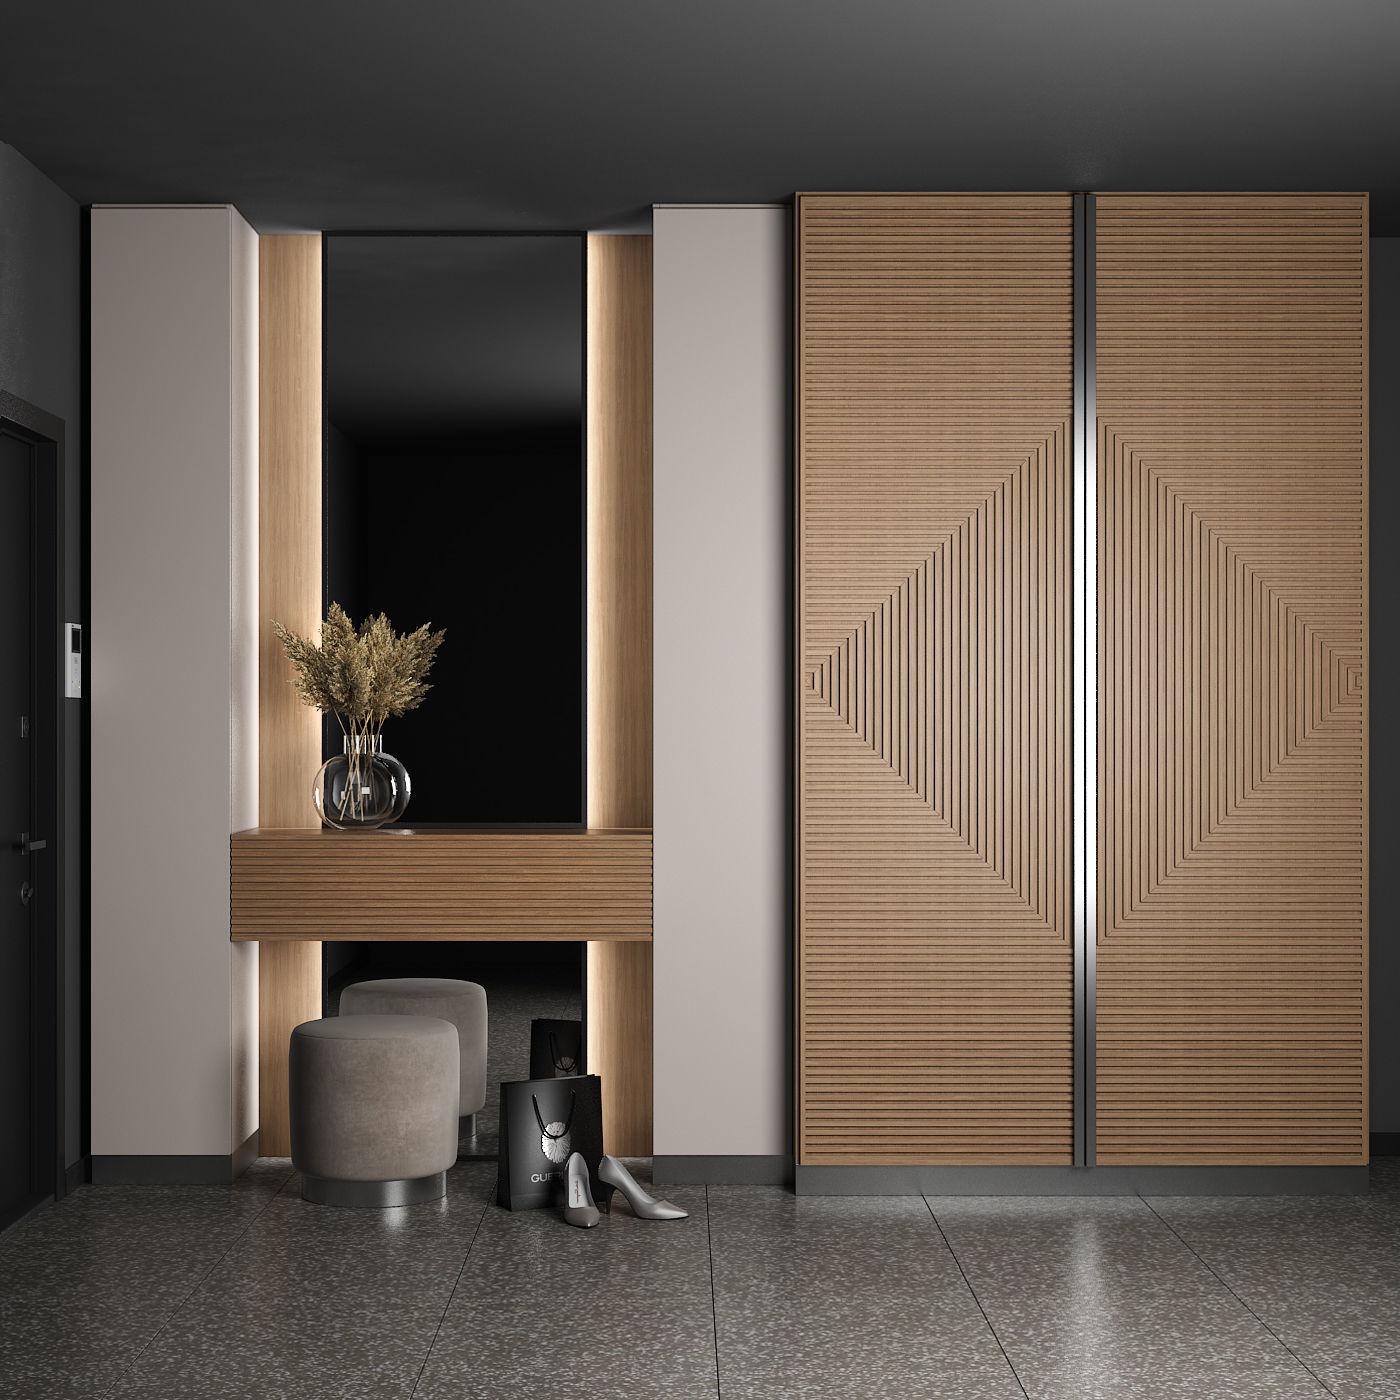 Furniture composition 37